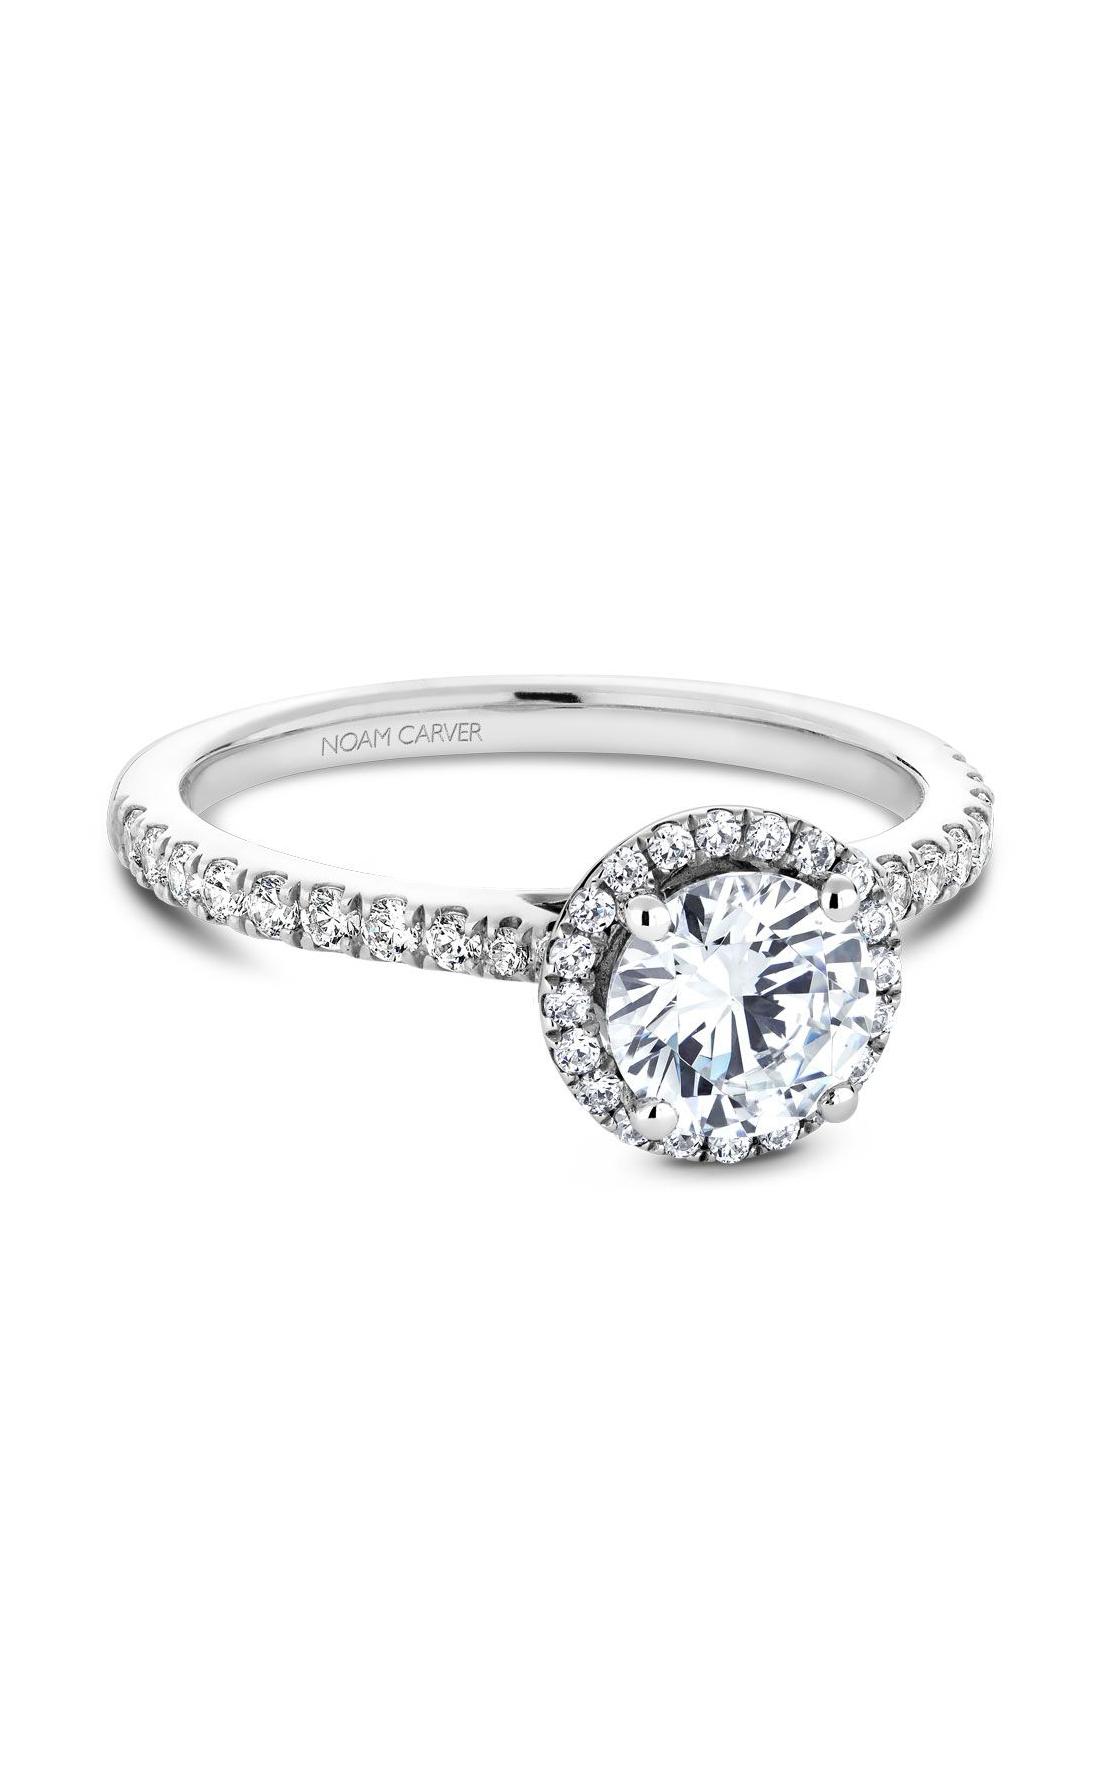 Noam Carver Halo Engagement Ring B142-05WM product image